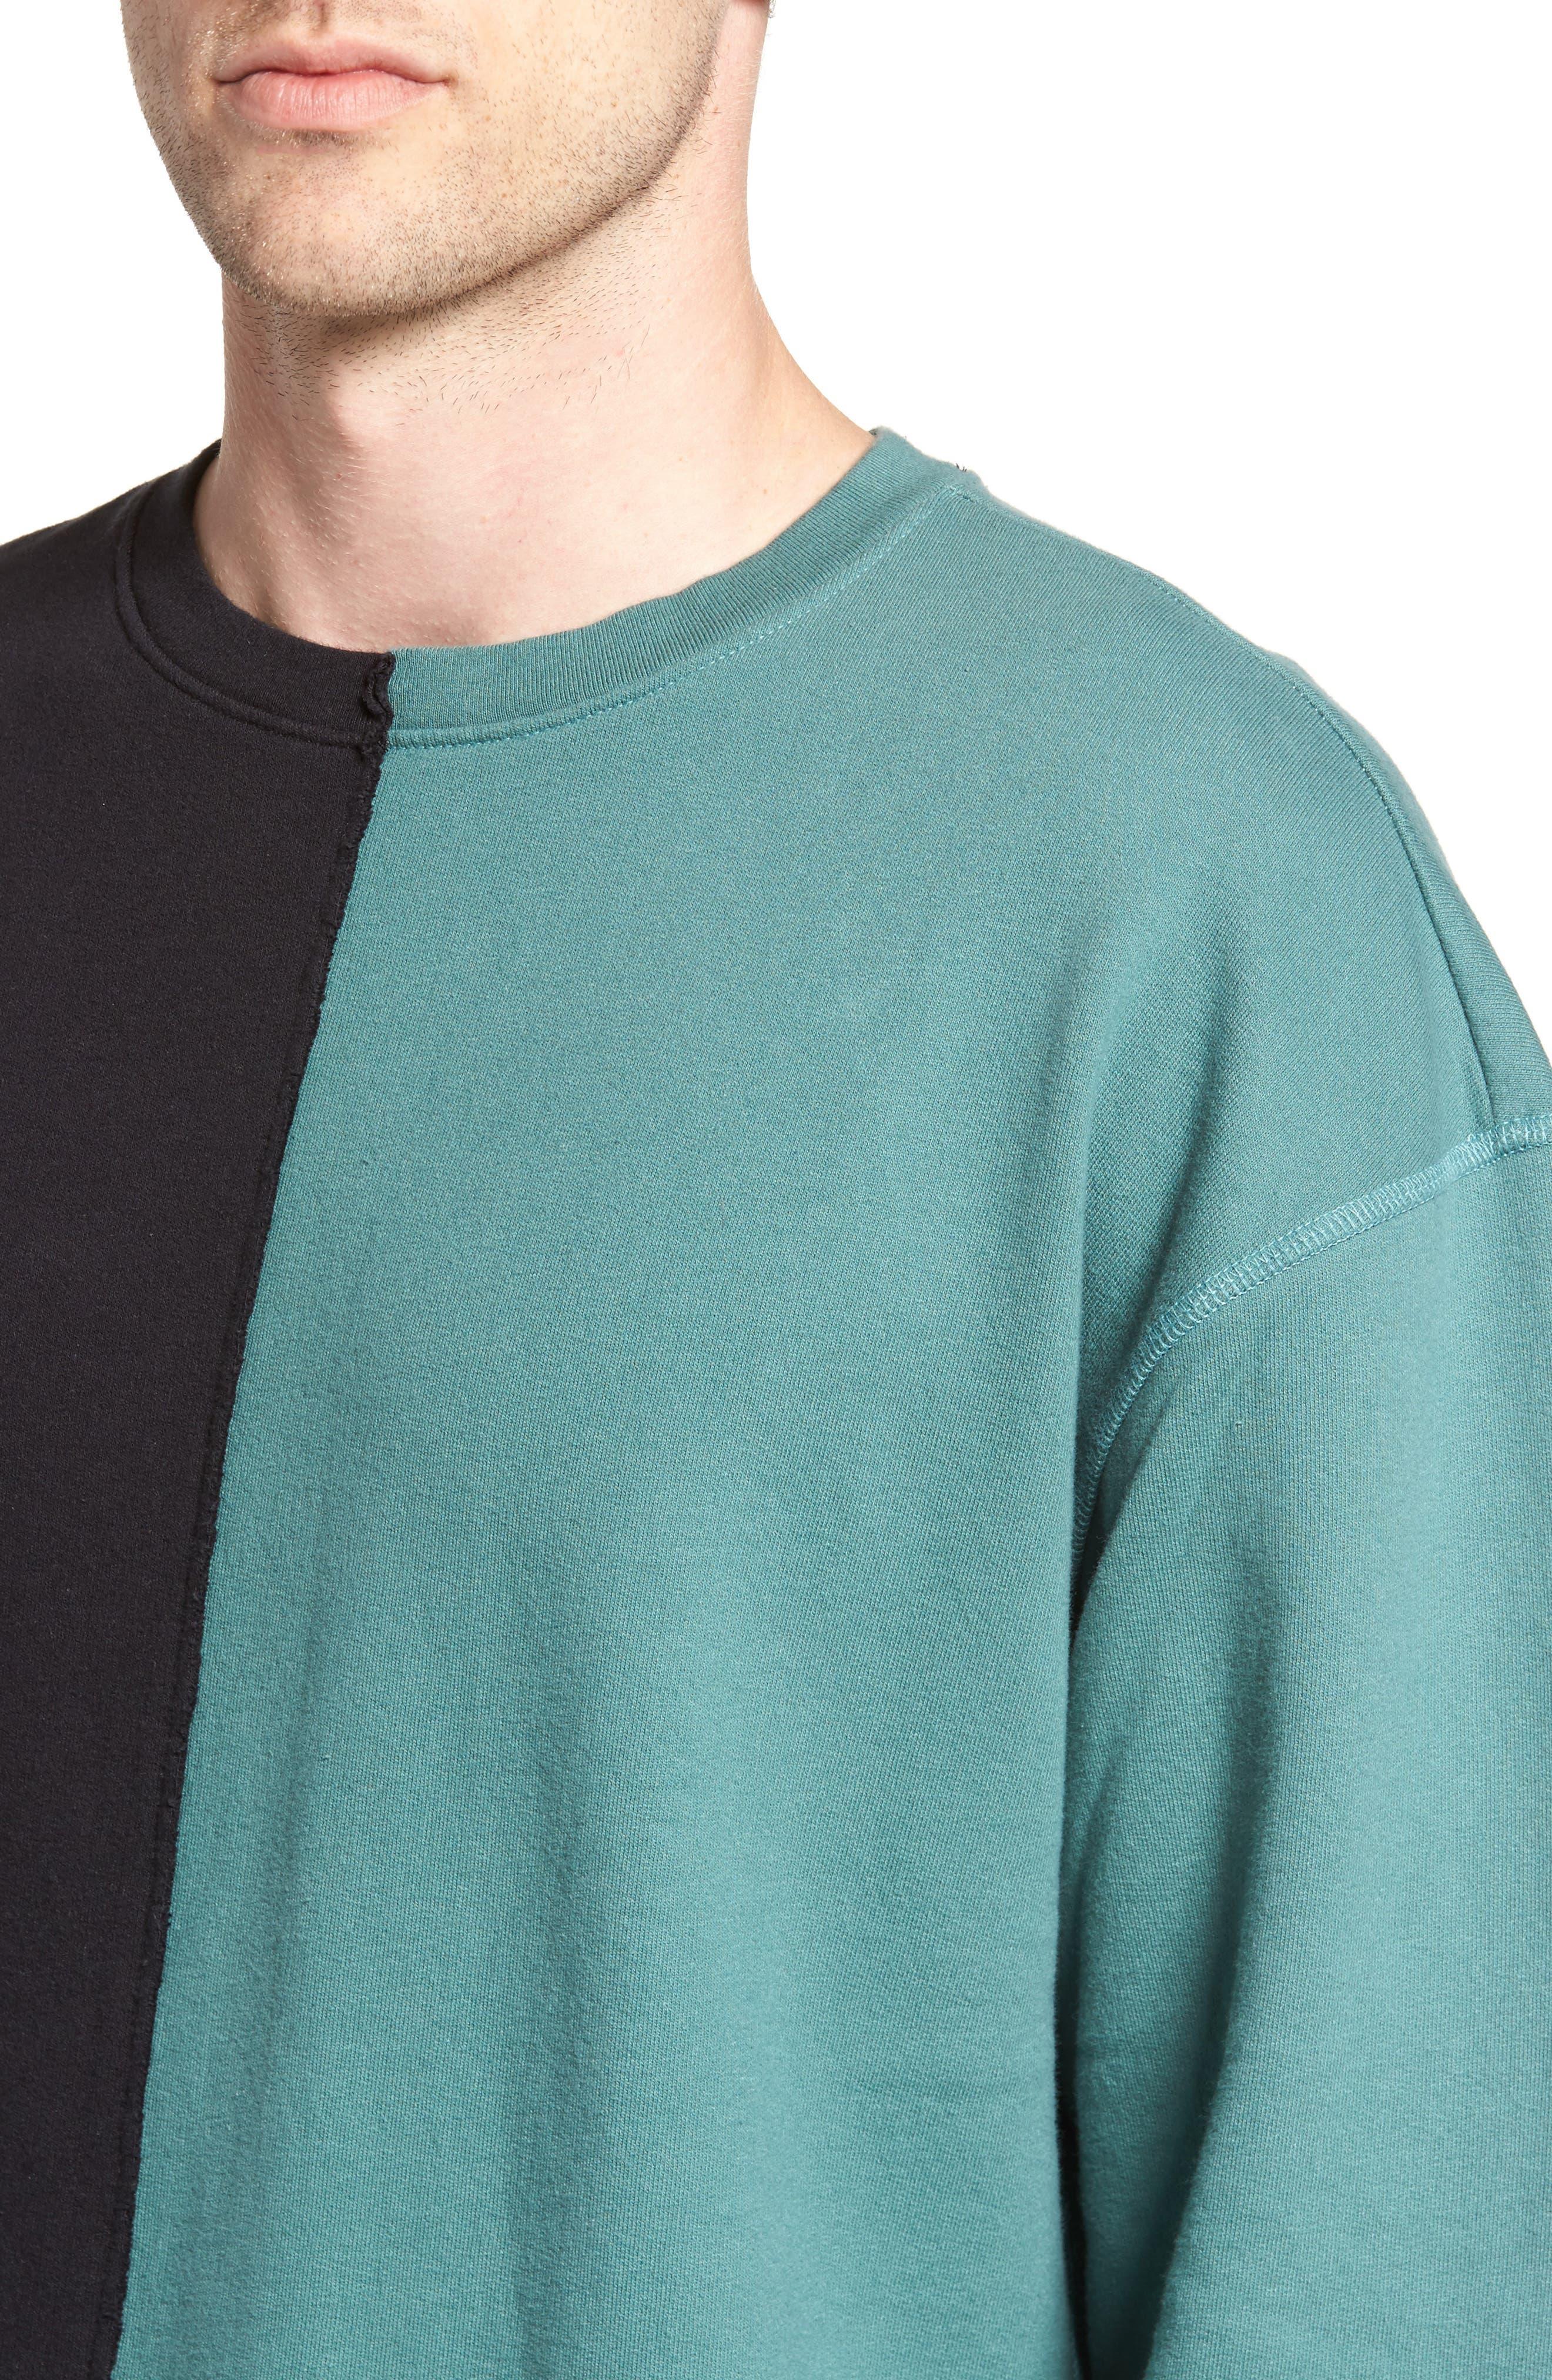 Colorblock T-Shirt,                             Alternate thumbnail 4, color,                             Black Rock / Green Pine